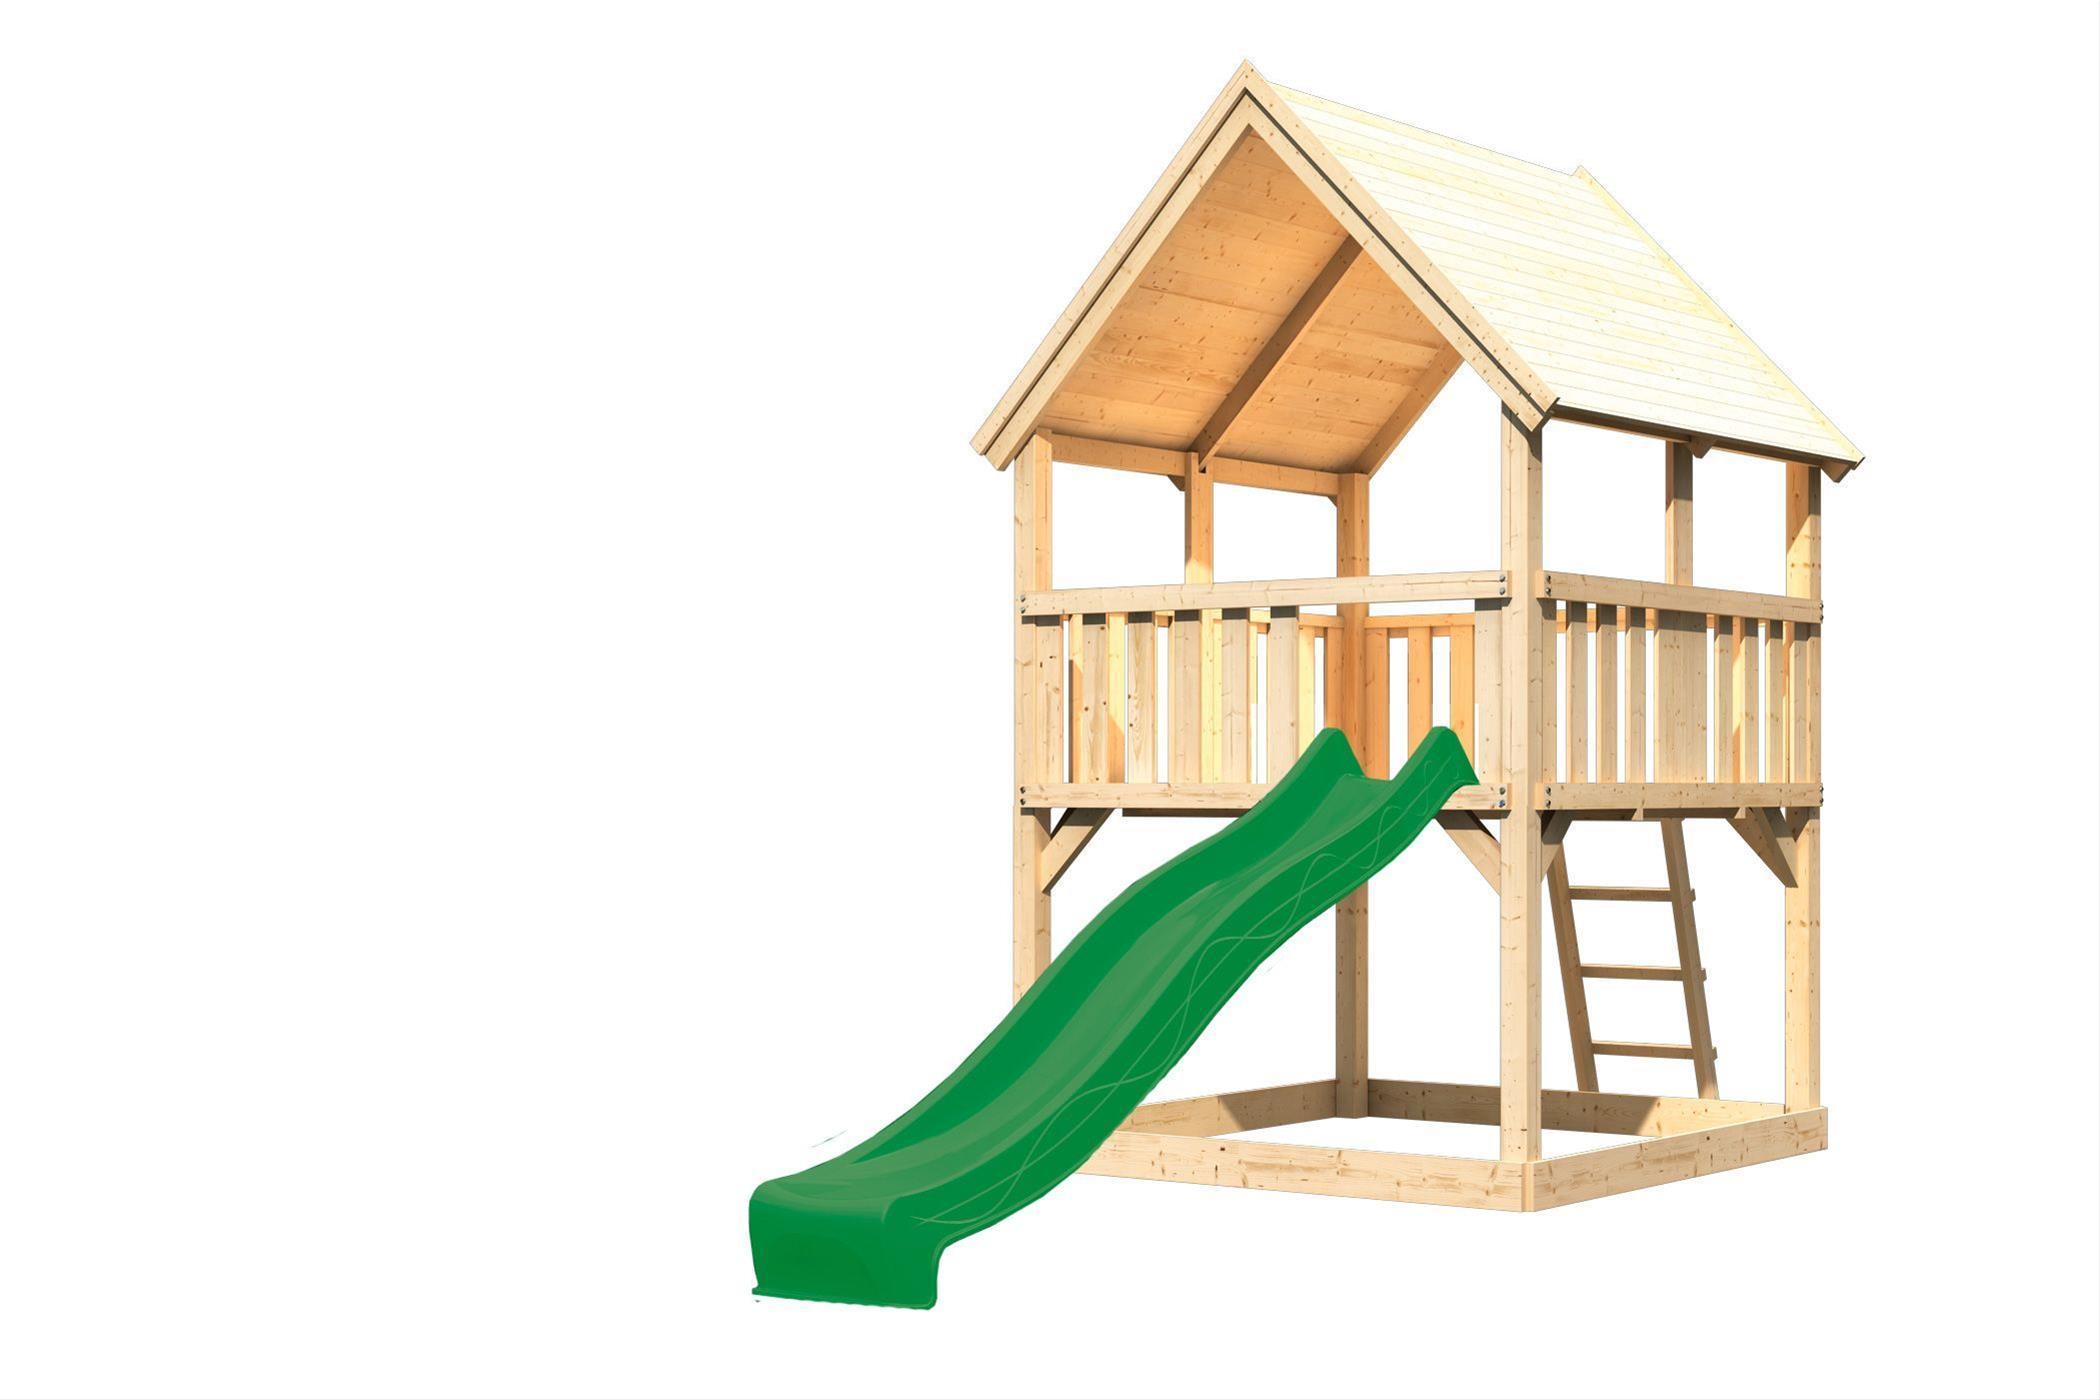 Spielturm / Kletterturm Karibu Akubi Luis Set A Rutsche grün 217x205cm Bild 2